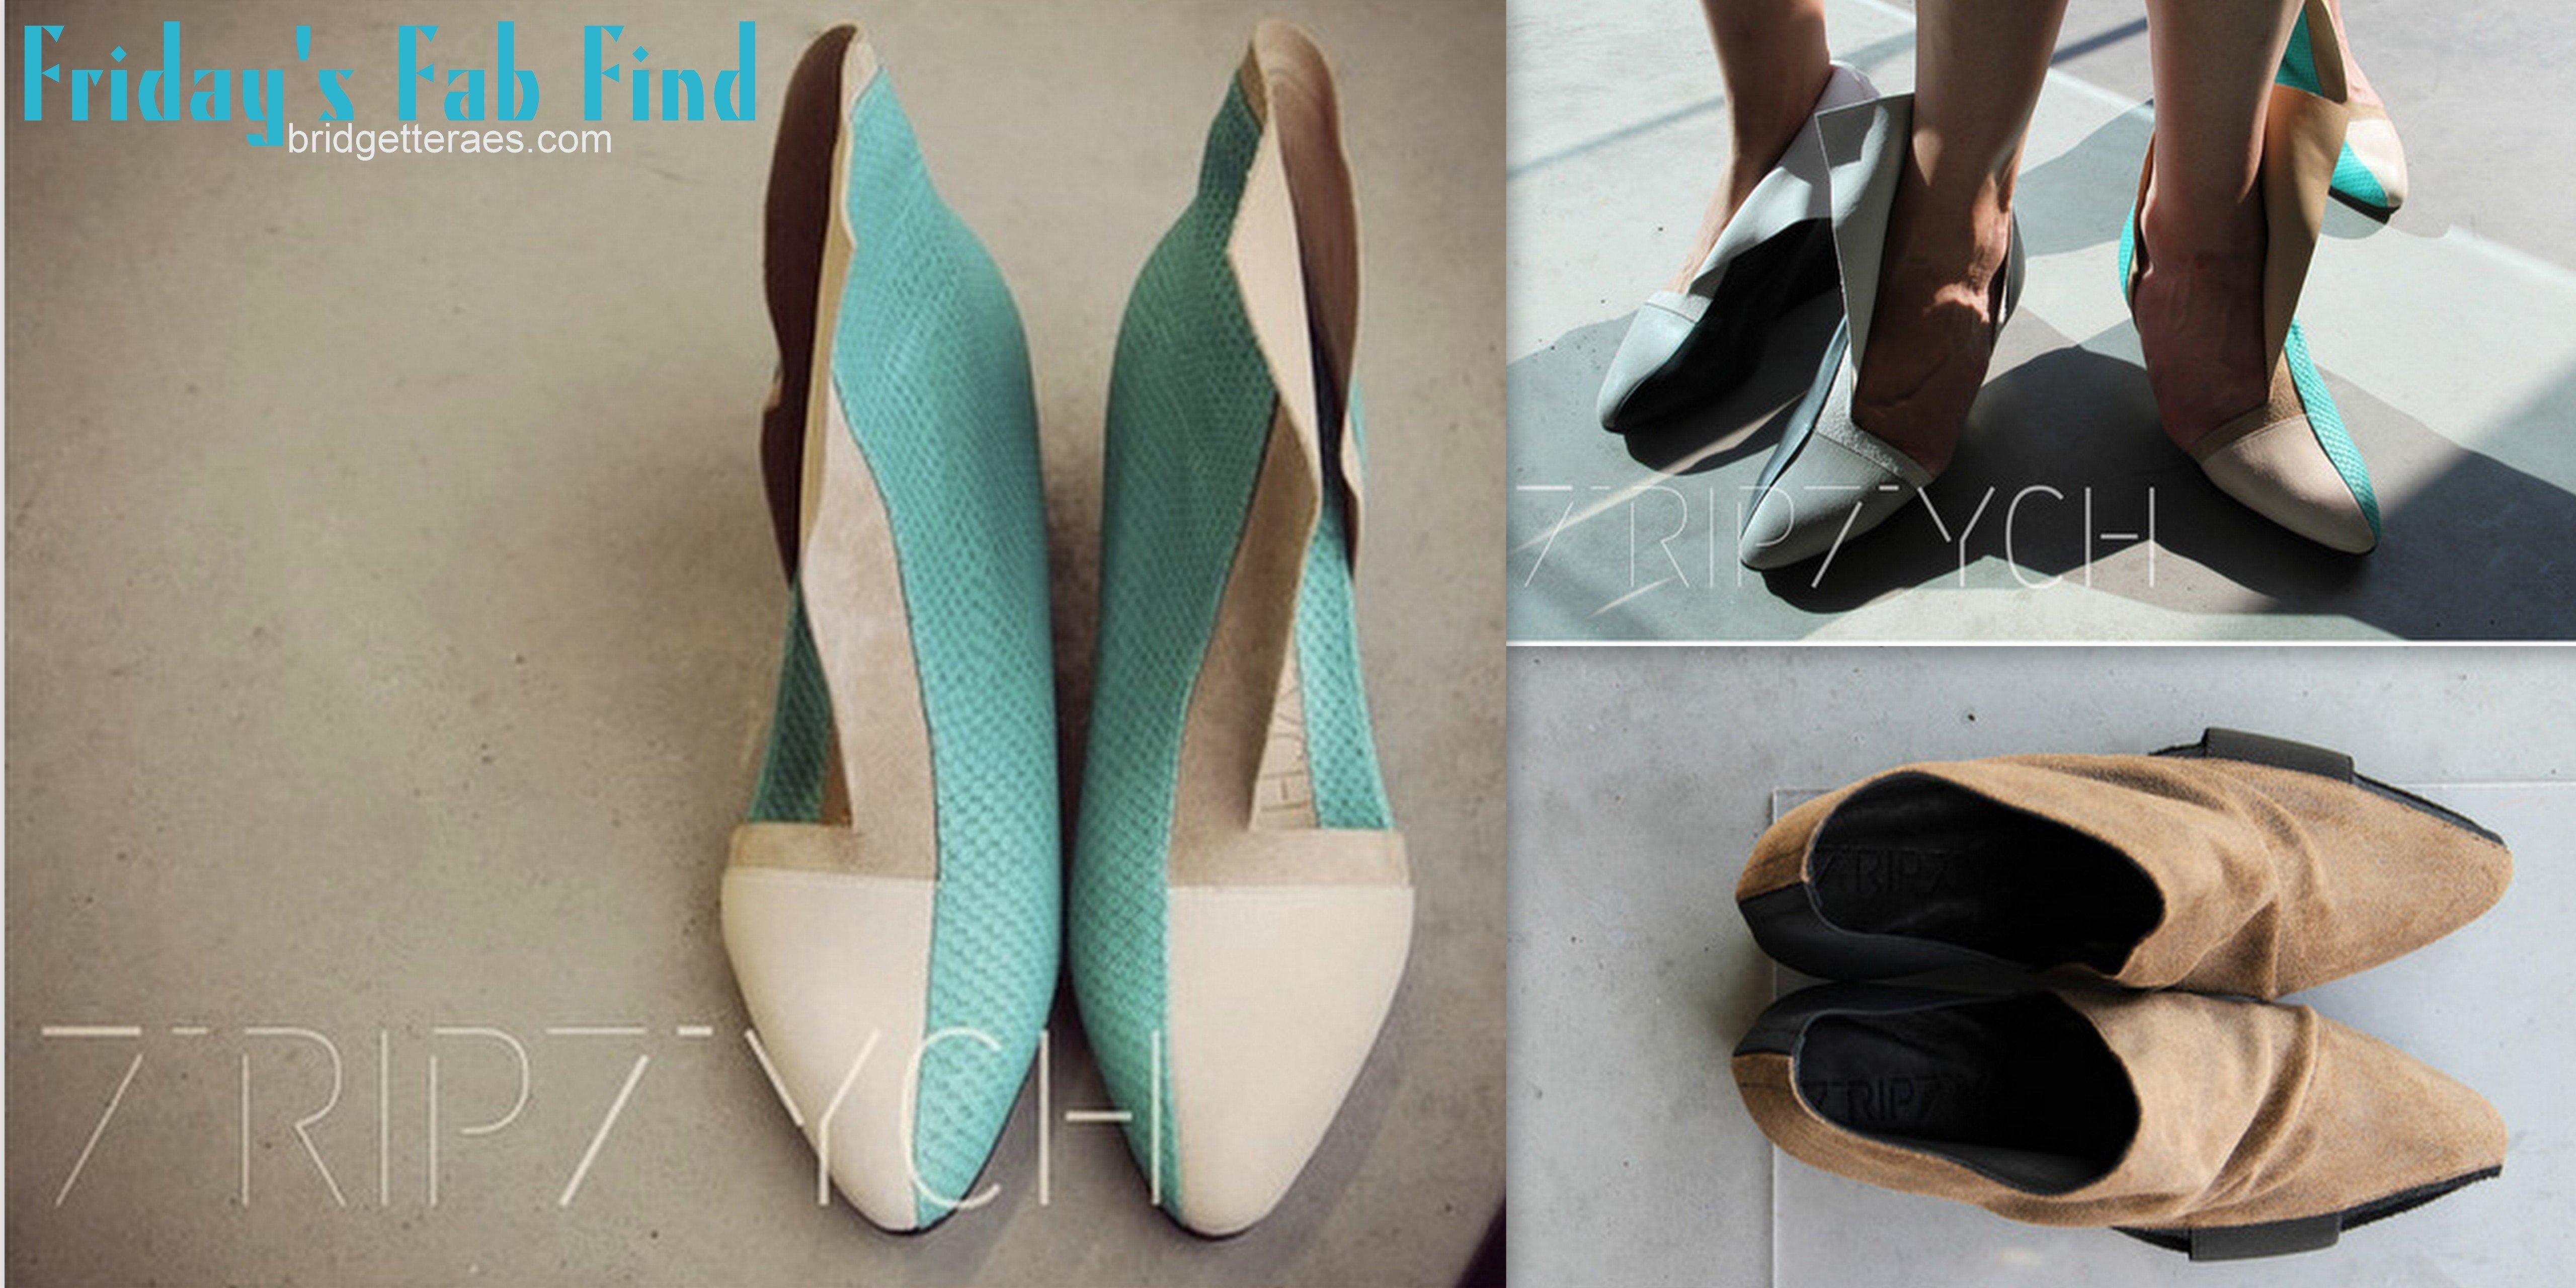 Friday's Fab Find: TRIPTYCH Artisanal Footwear